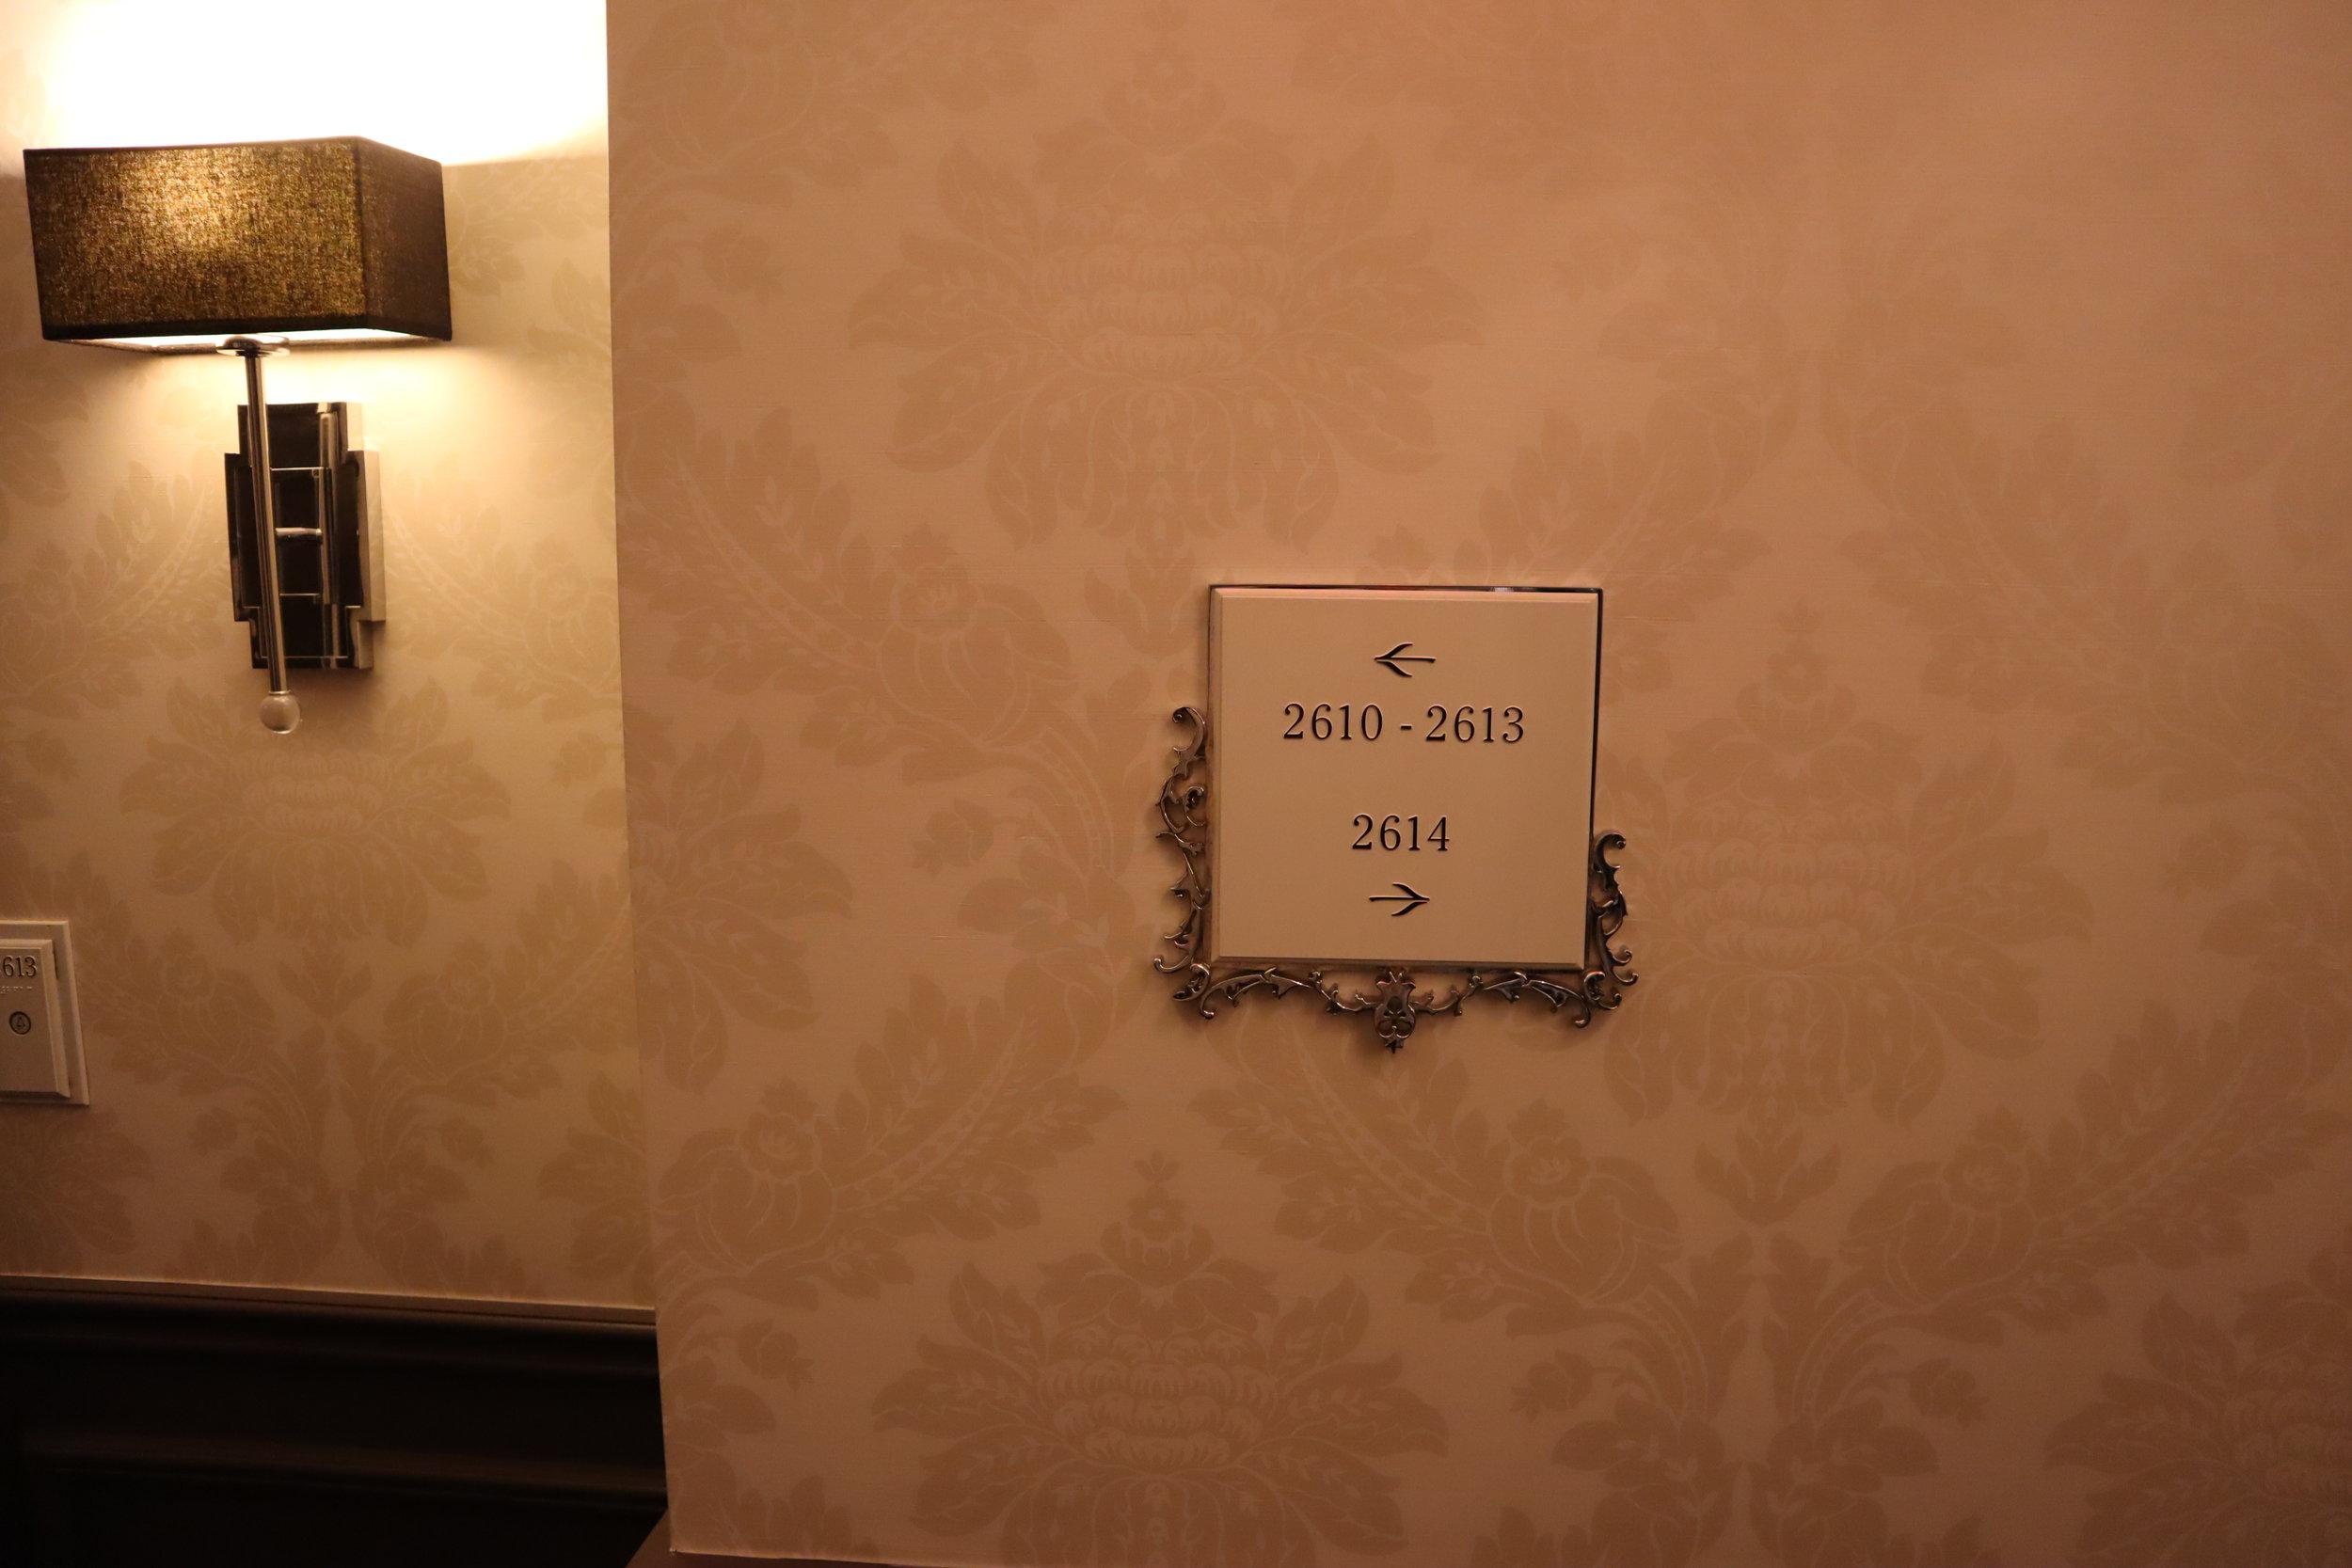 St. Regis Toronto – Hallway sign